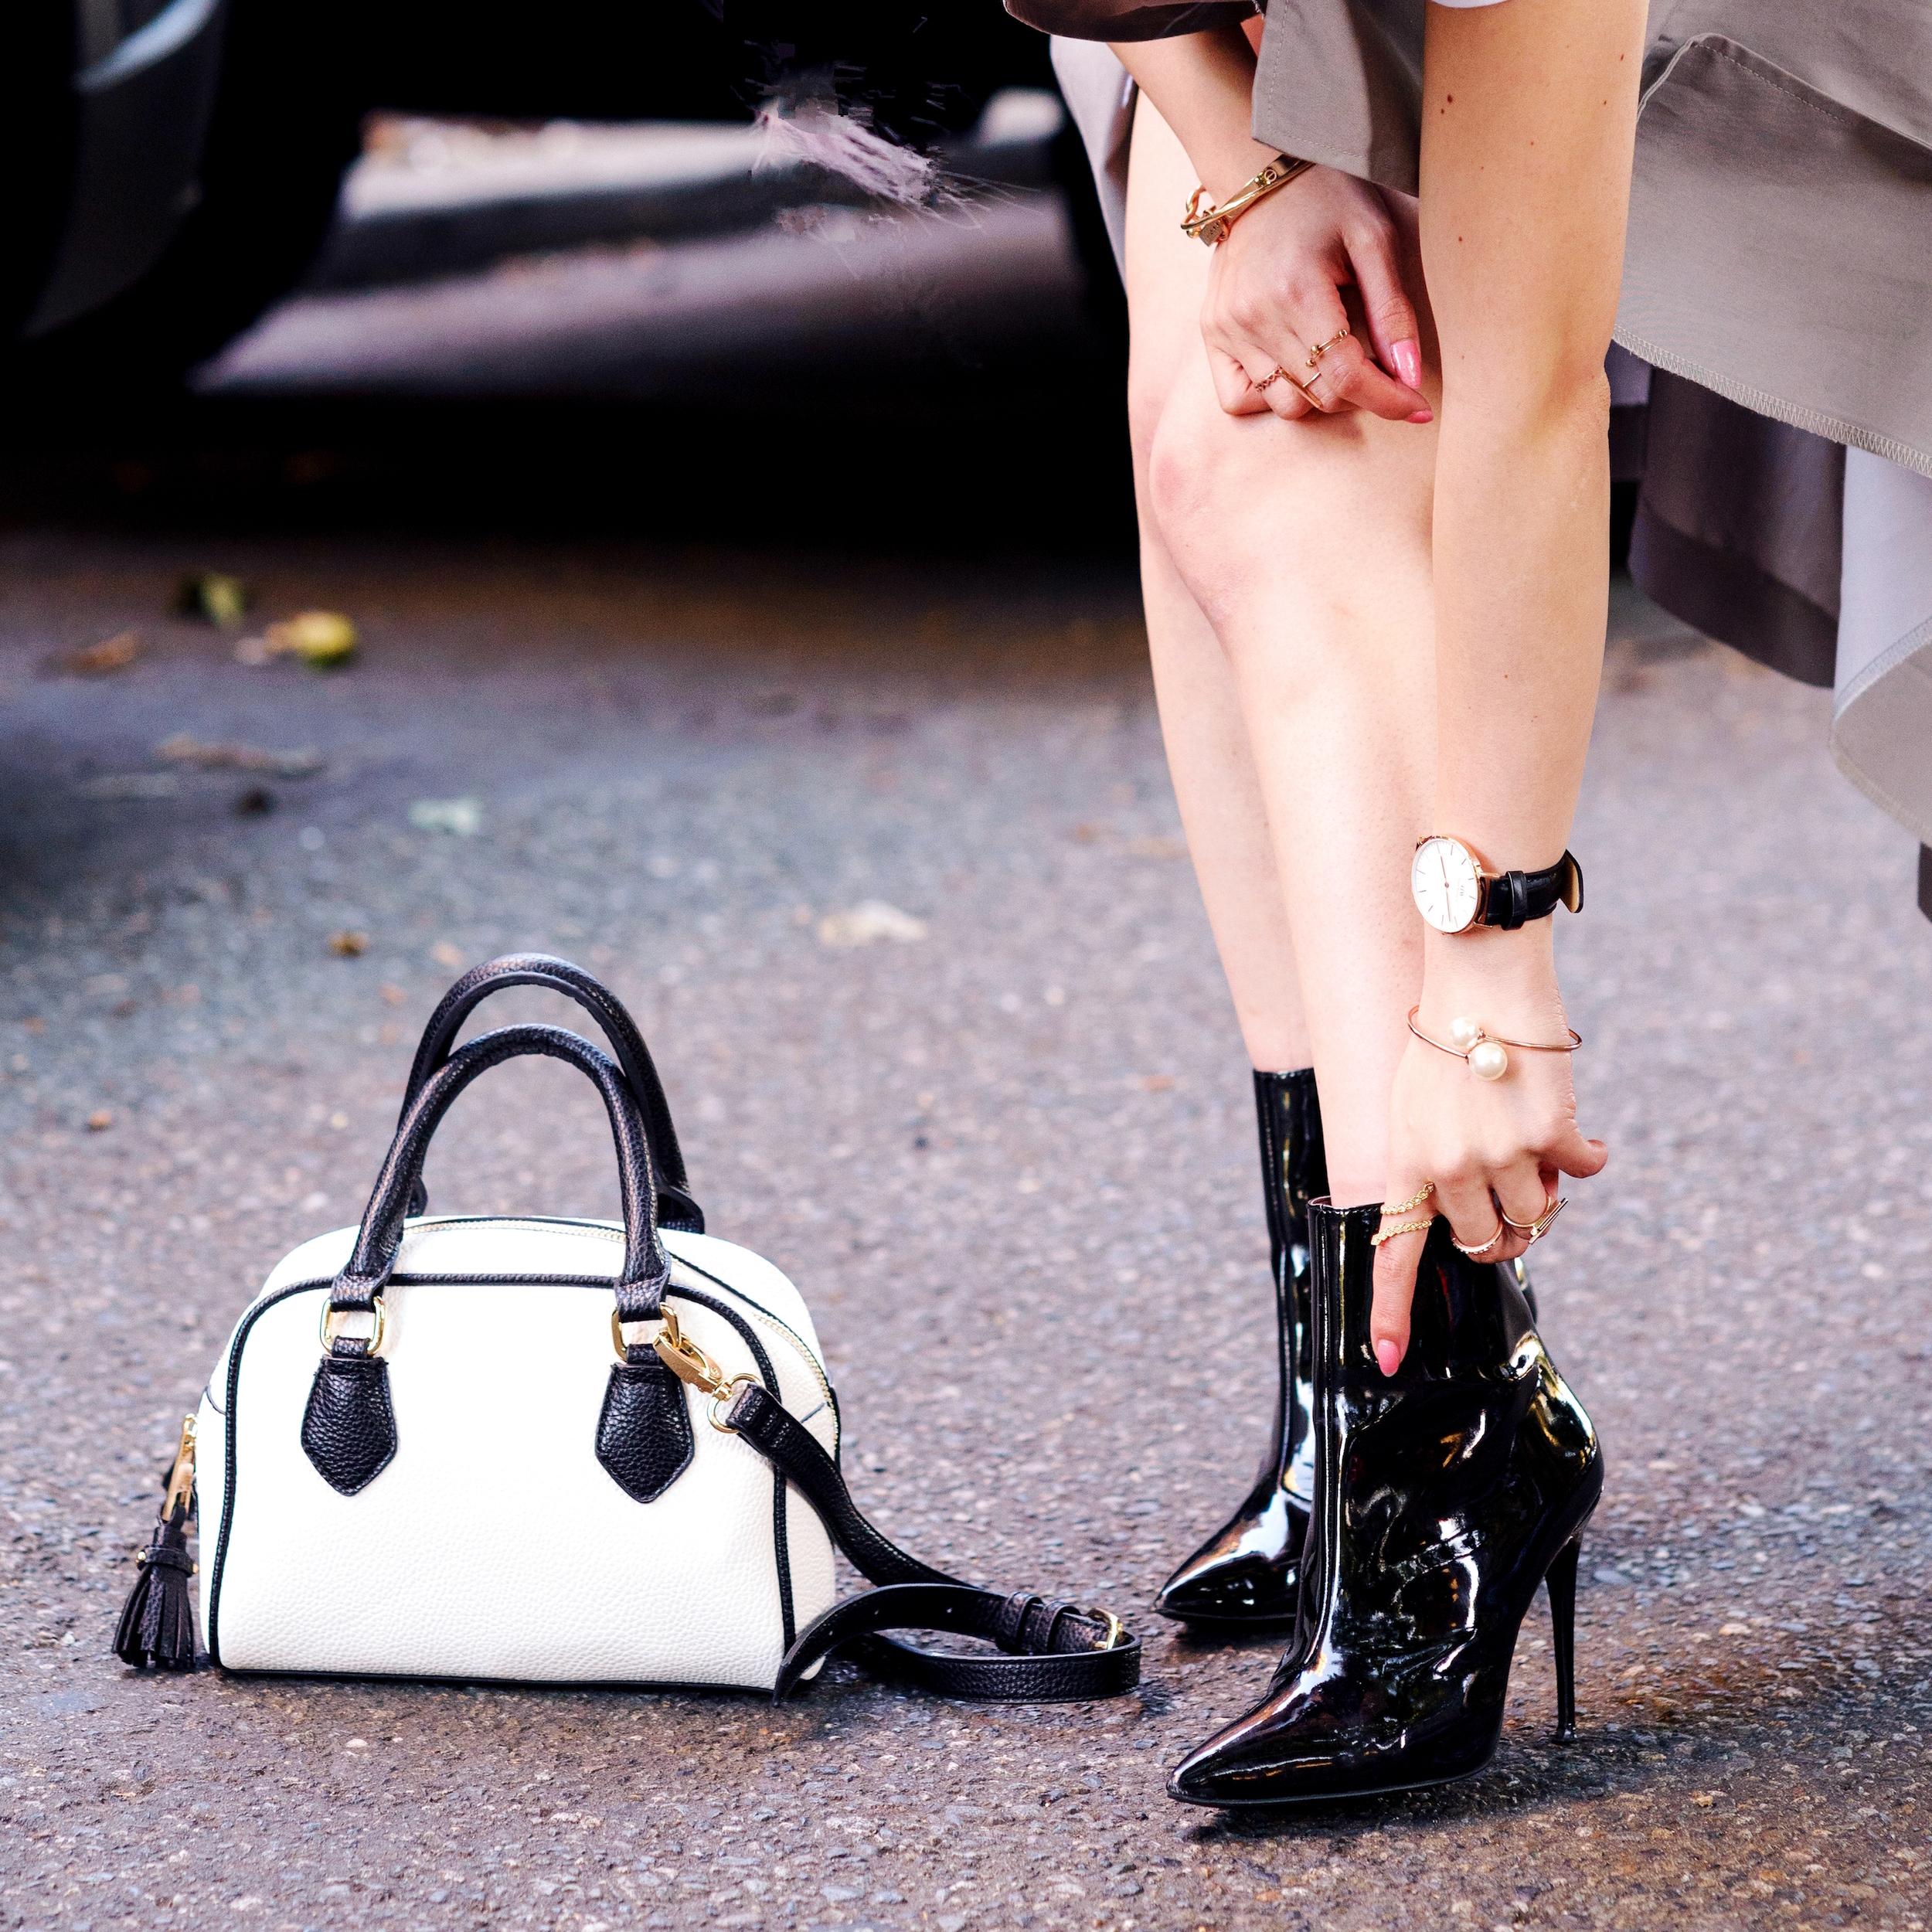 ALDO Patent Boots_ZARA Mini Bag_Daniel Wellington Watch_Aikas Love Cloeset_Seattle Fashion Blogger from Japan_Lavender Hair_Messy low bun Hair 2